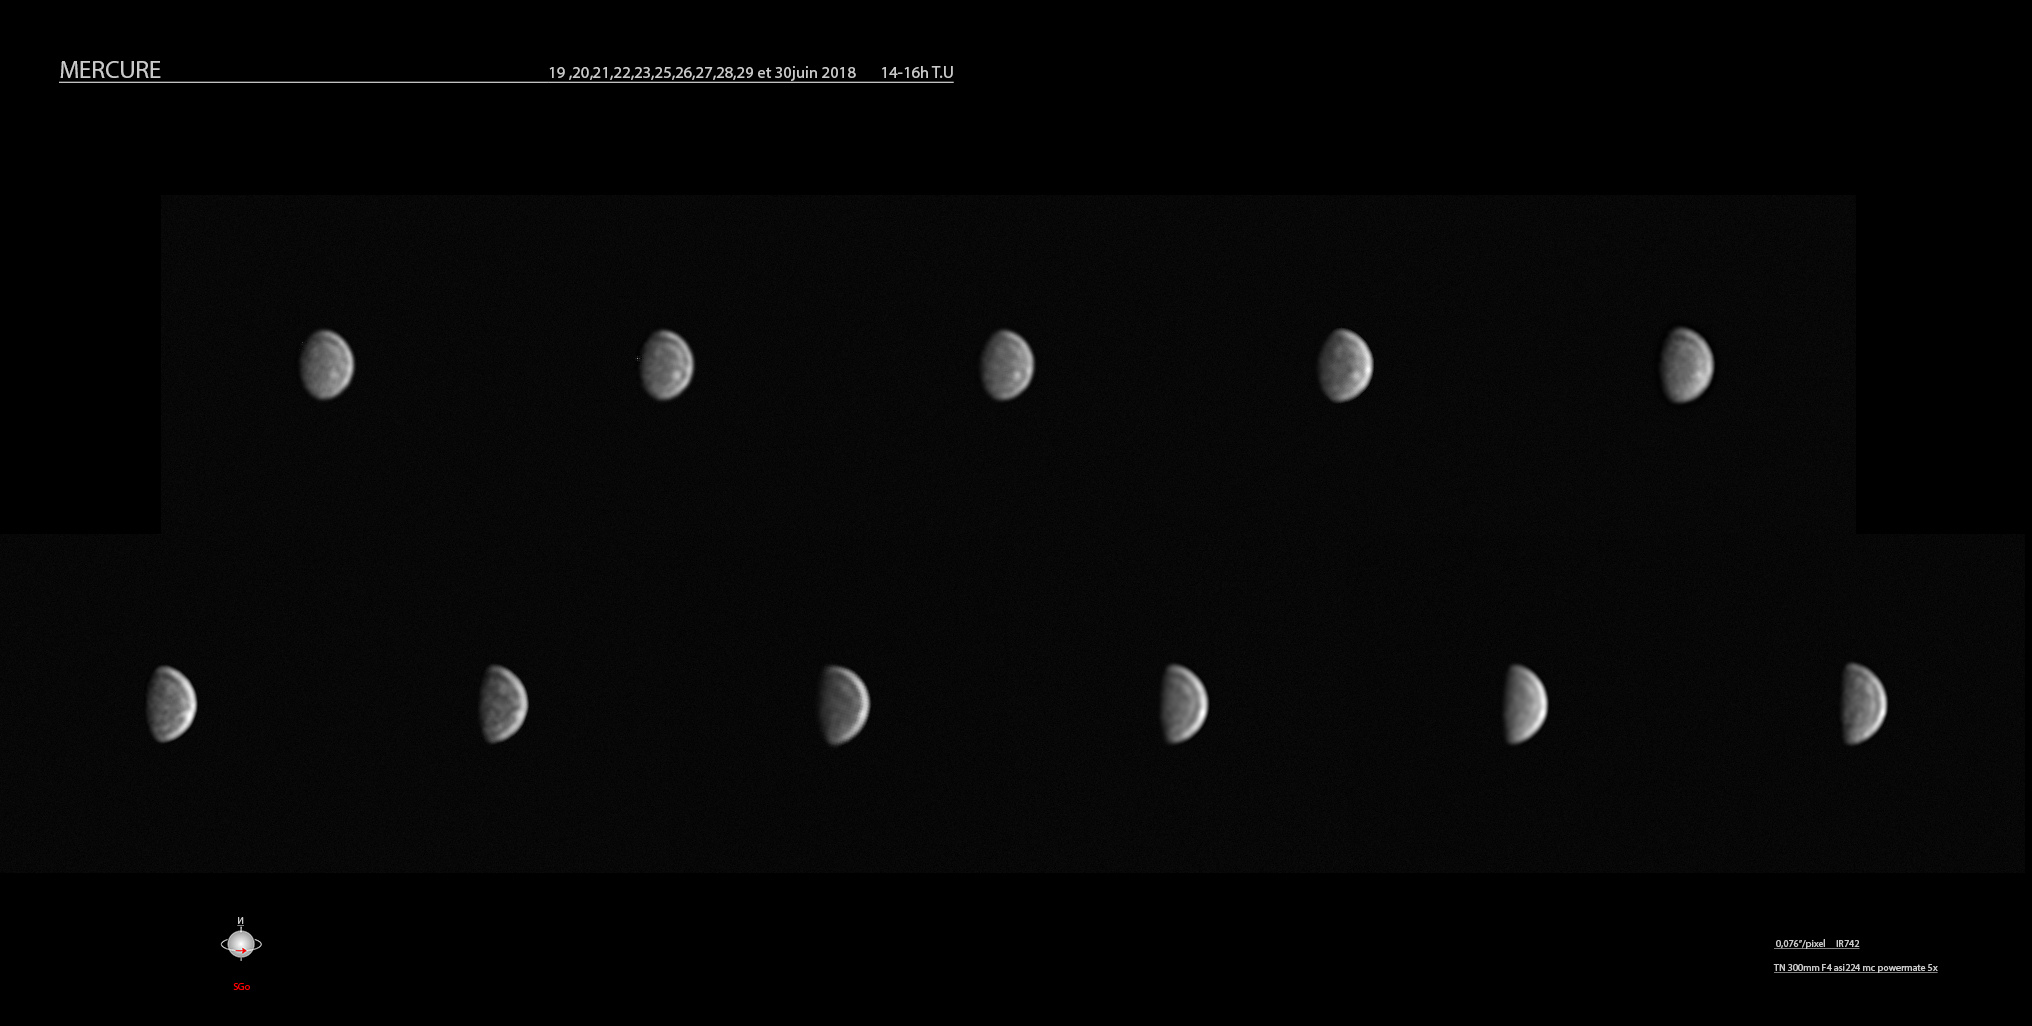 mercure du 19-30 juin 2018.jpg